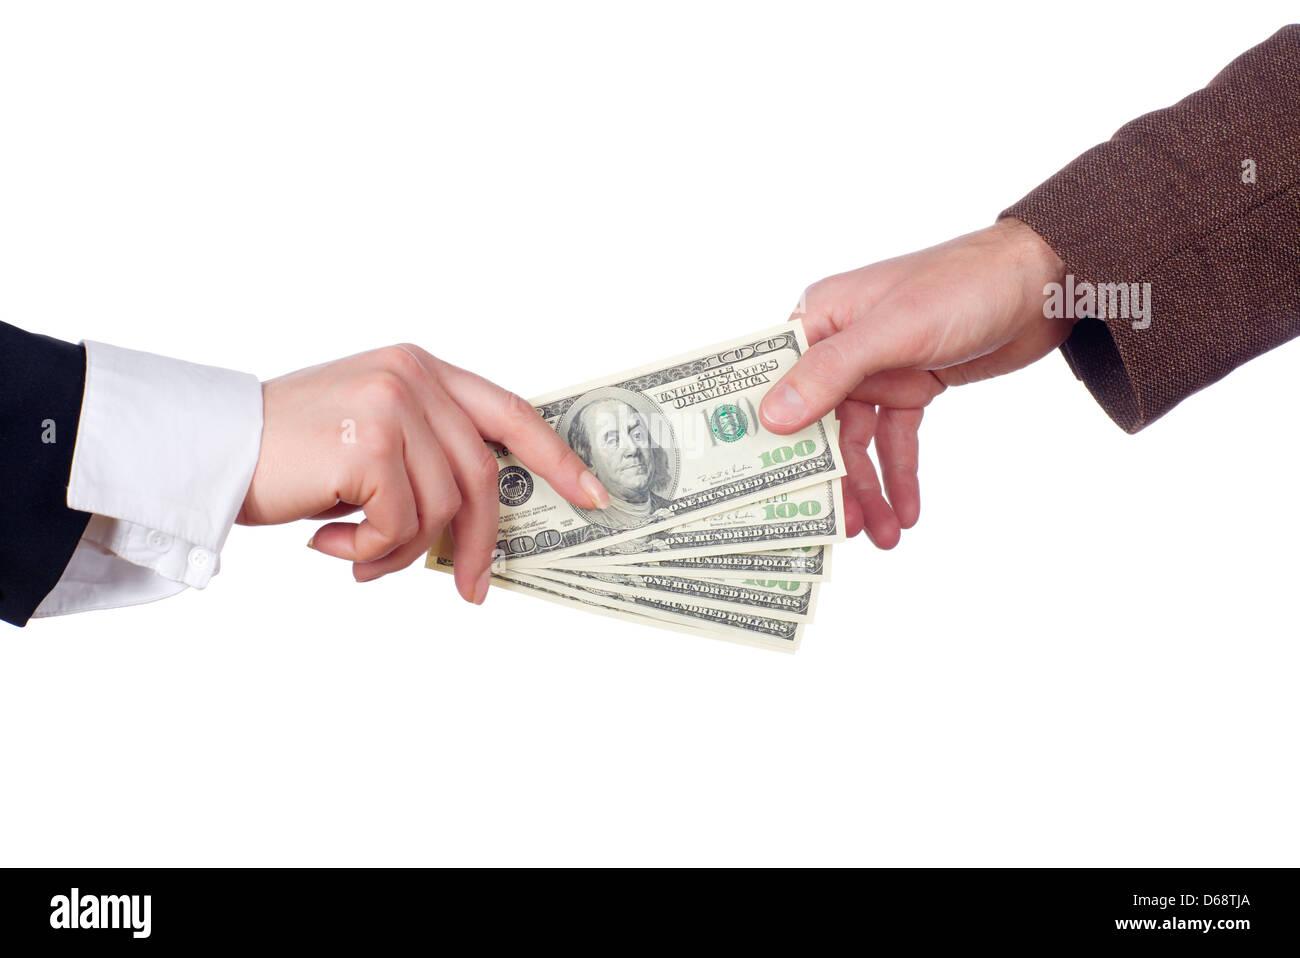 Business transaction. Isolated - Stock Image